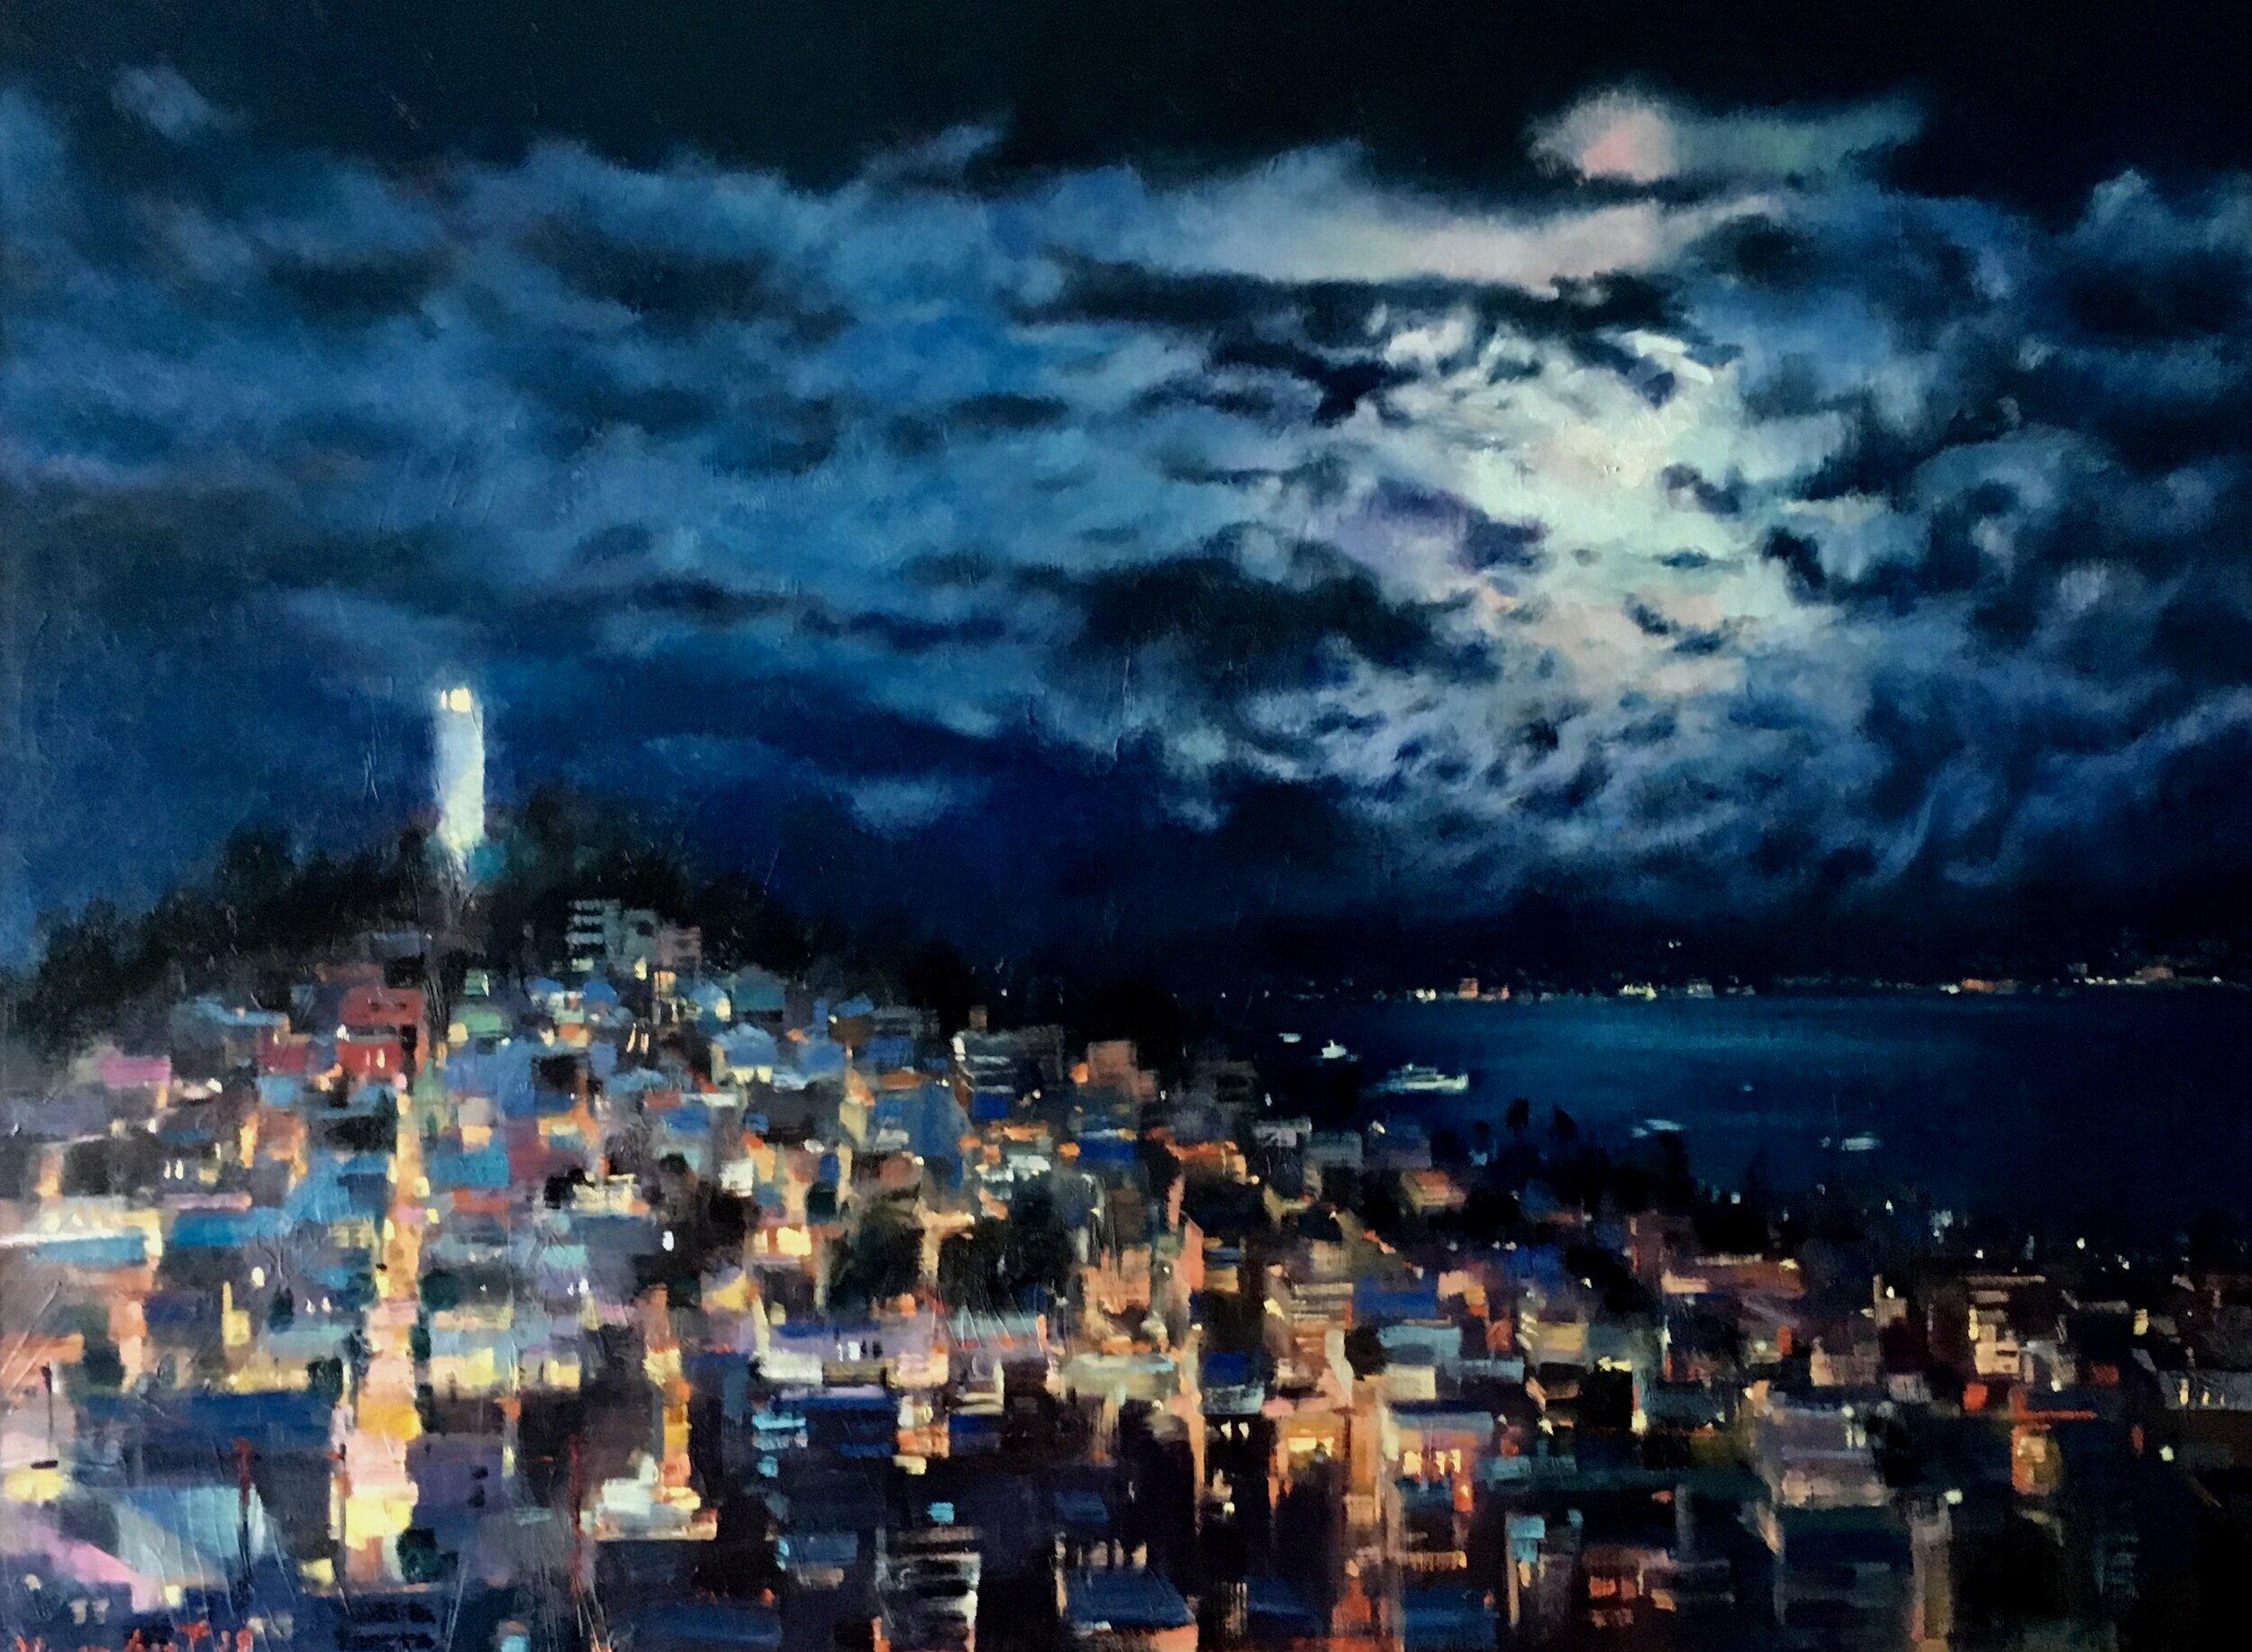 MOON LIGHT (COIT TOWER)